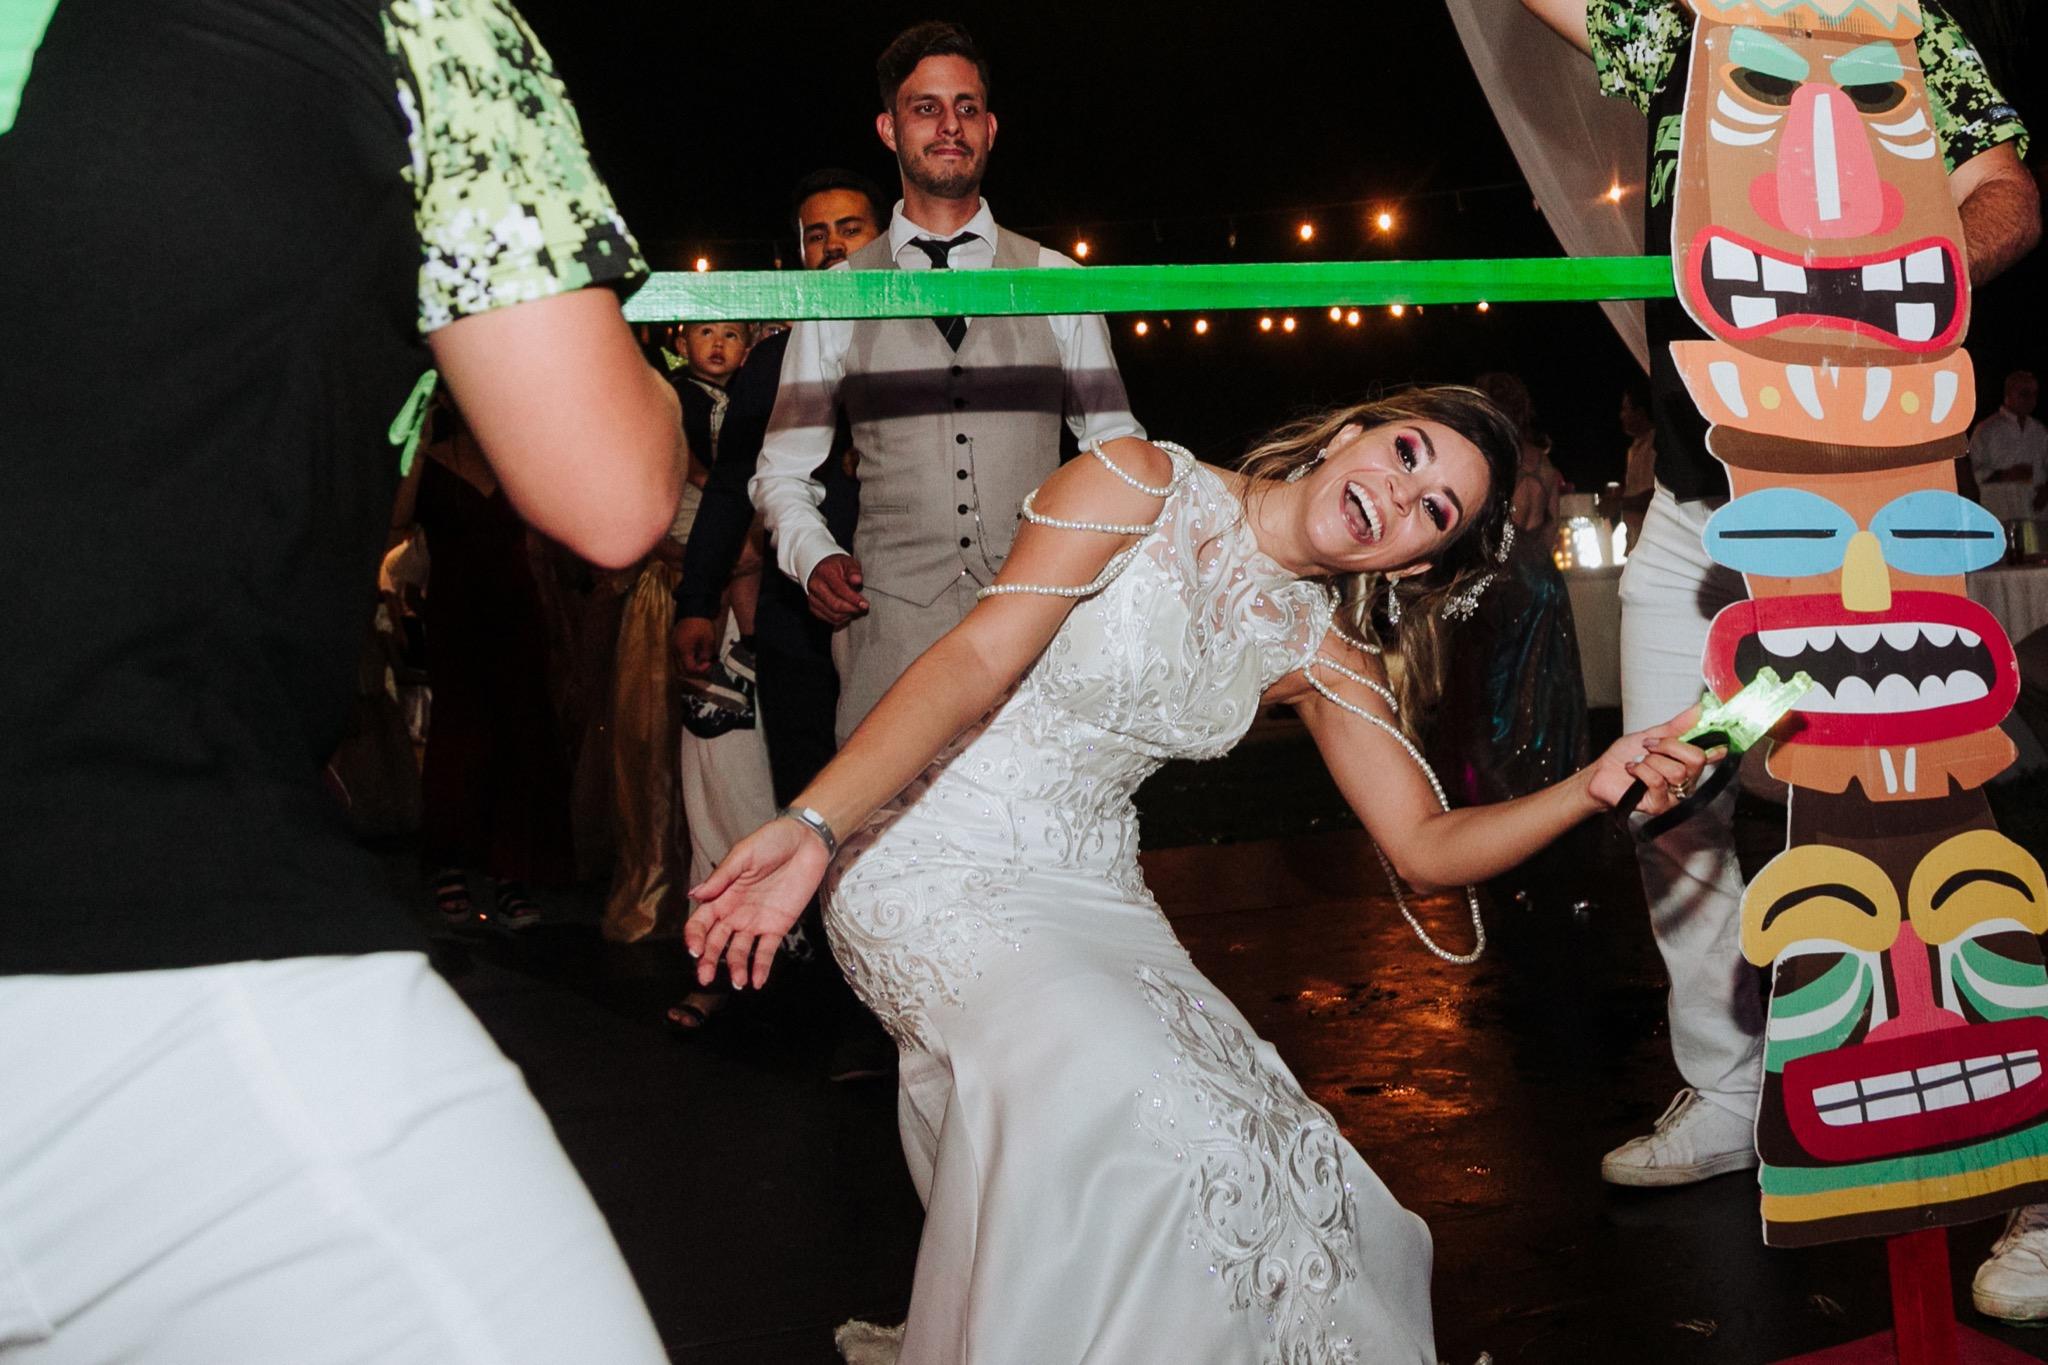 Javier_noriega_fotografo_bodas_profesional_zacatecas_mexico_mazatlan_sinaloa_photographer_weddings85